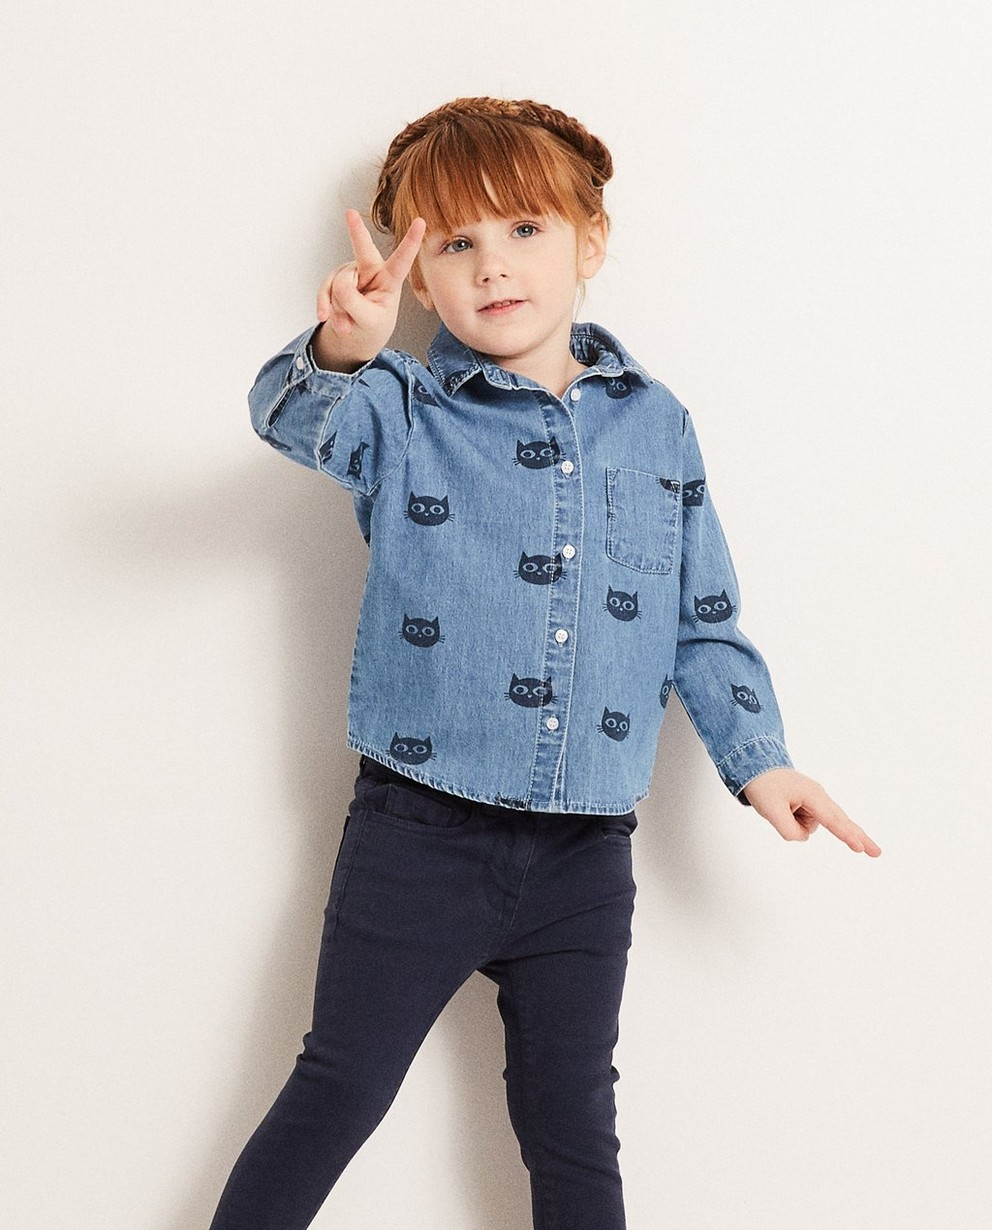 Hemden - AO1 - Jeanshemd mit Katzenprint